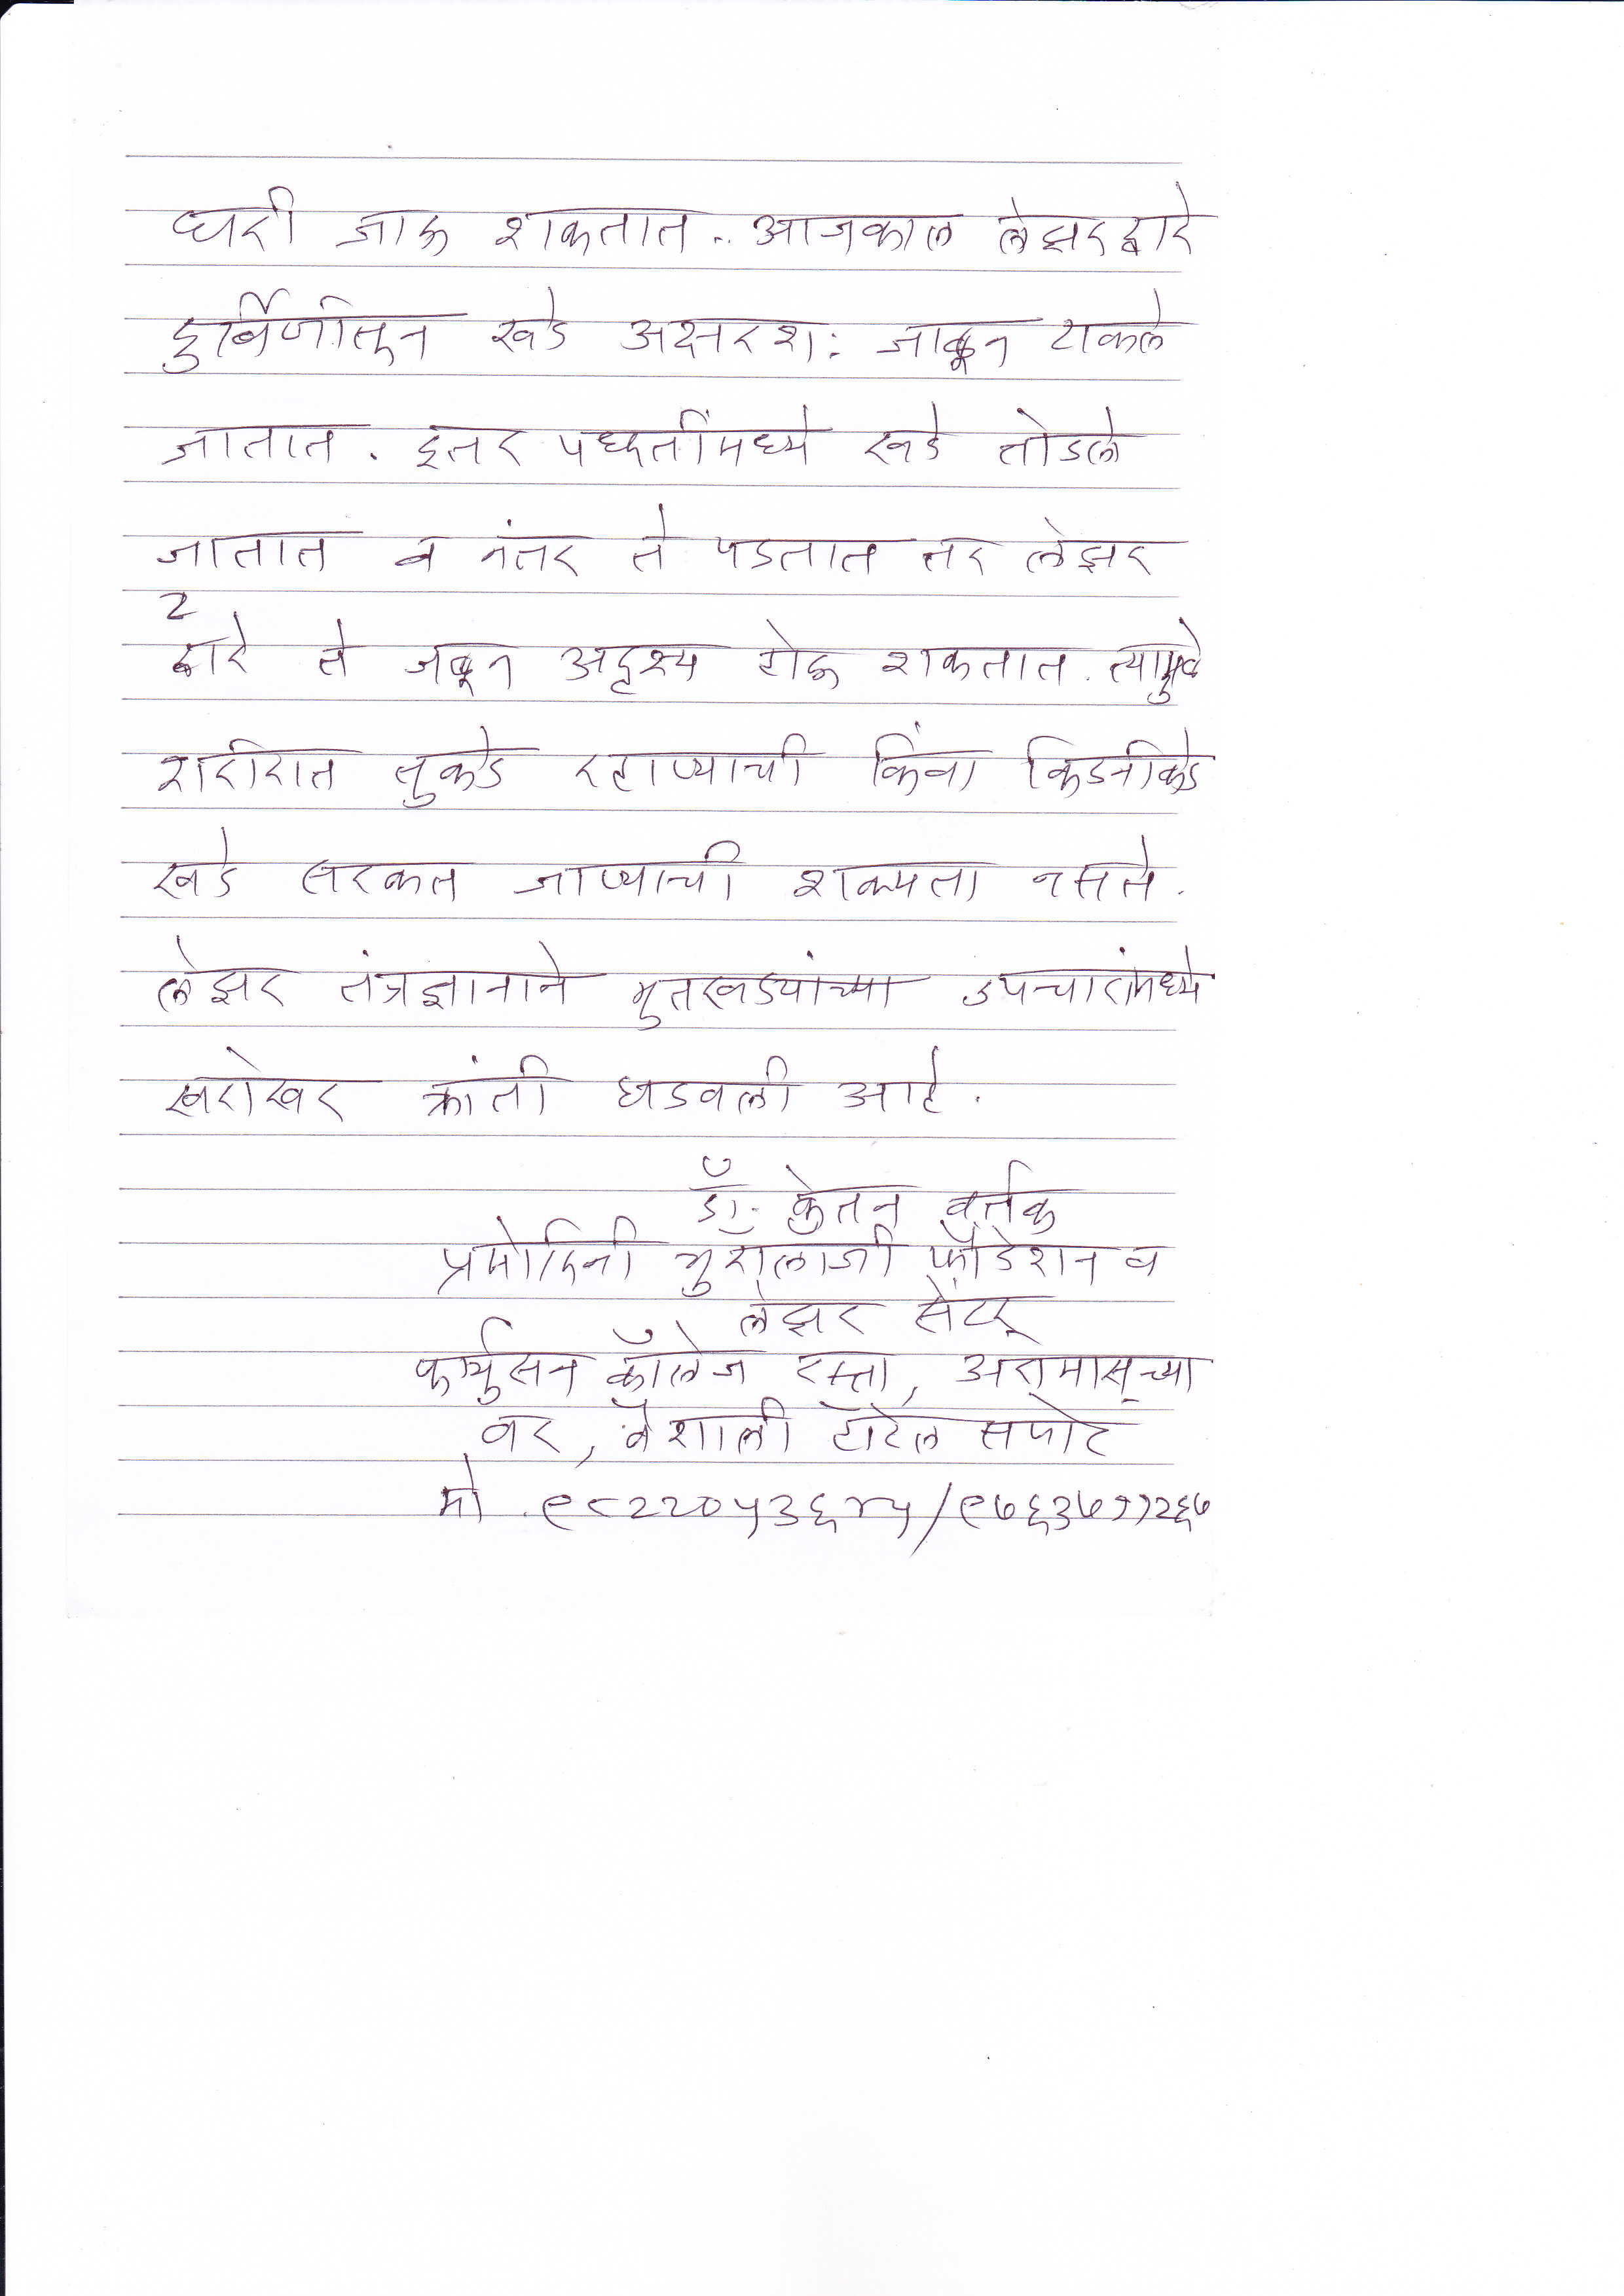 Best urologist in Pune,India - Dr. Ketan Vartak